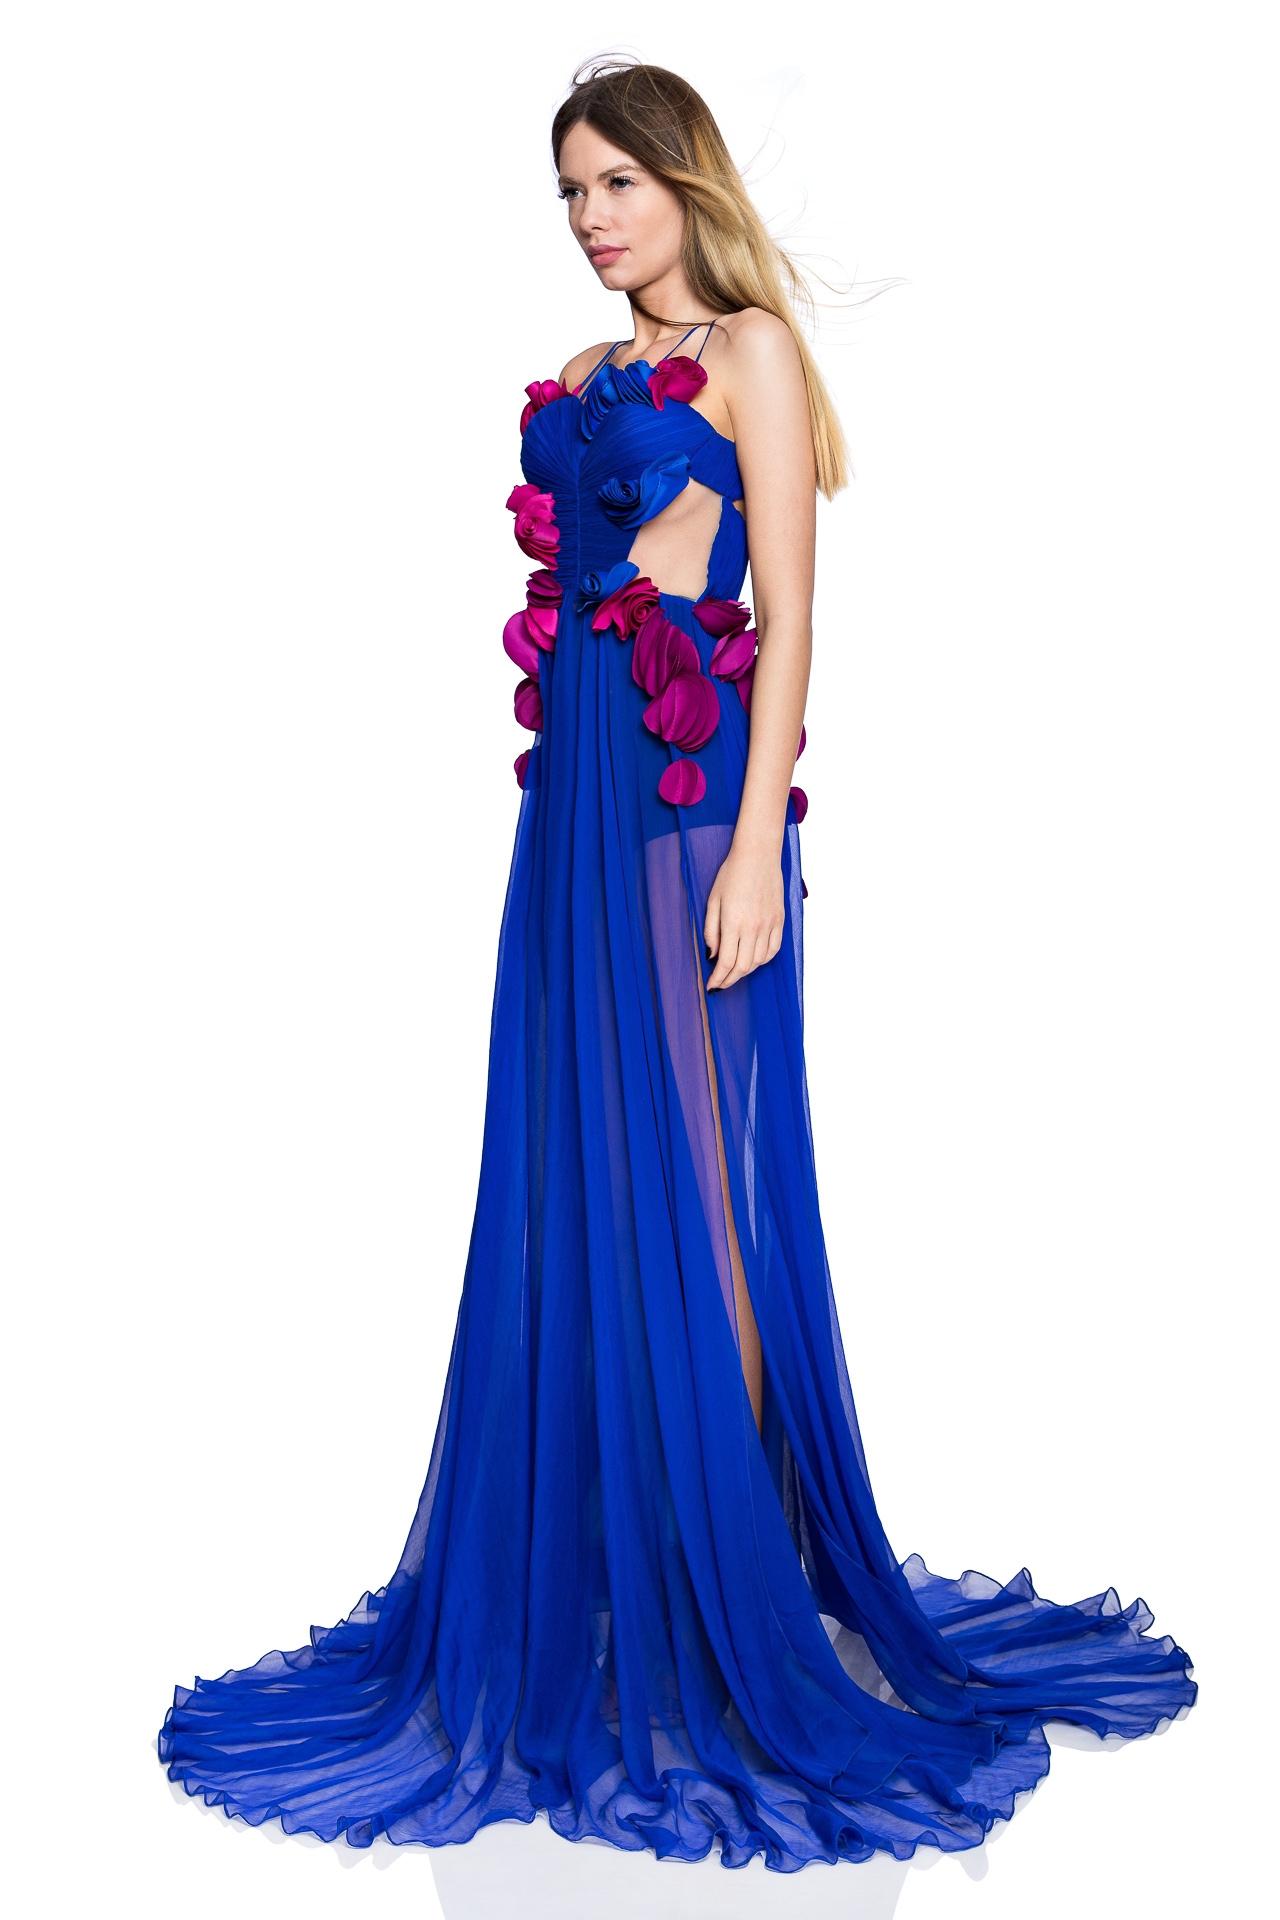 Blue corset prom dress